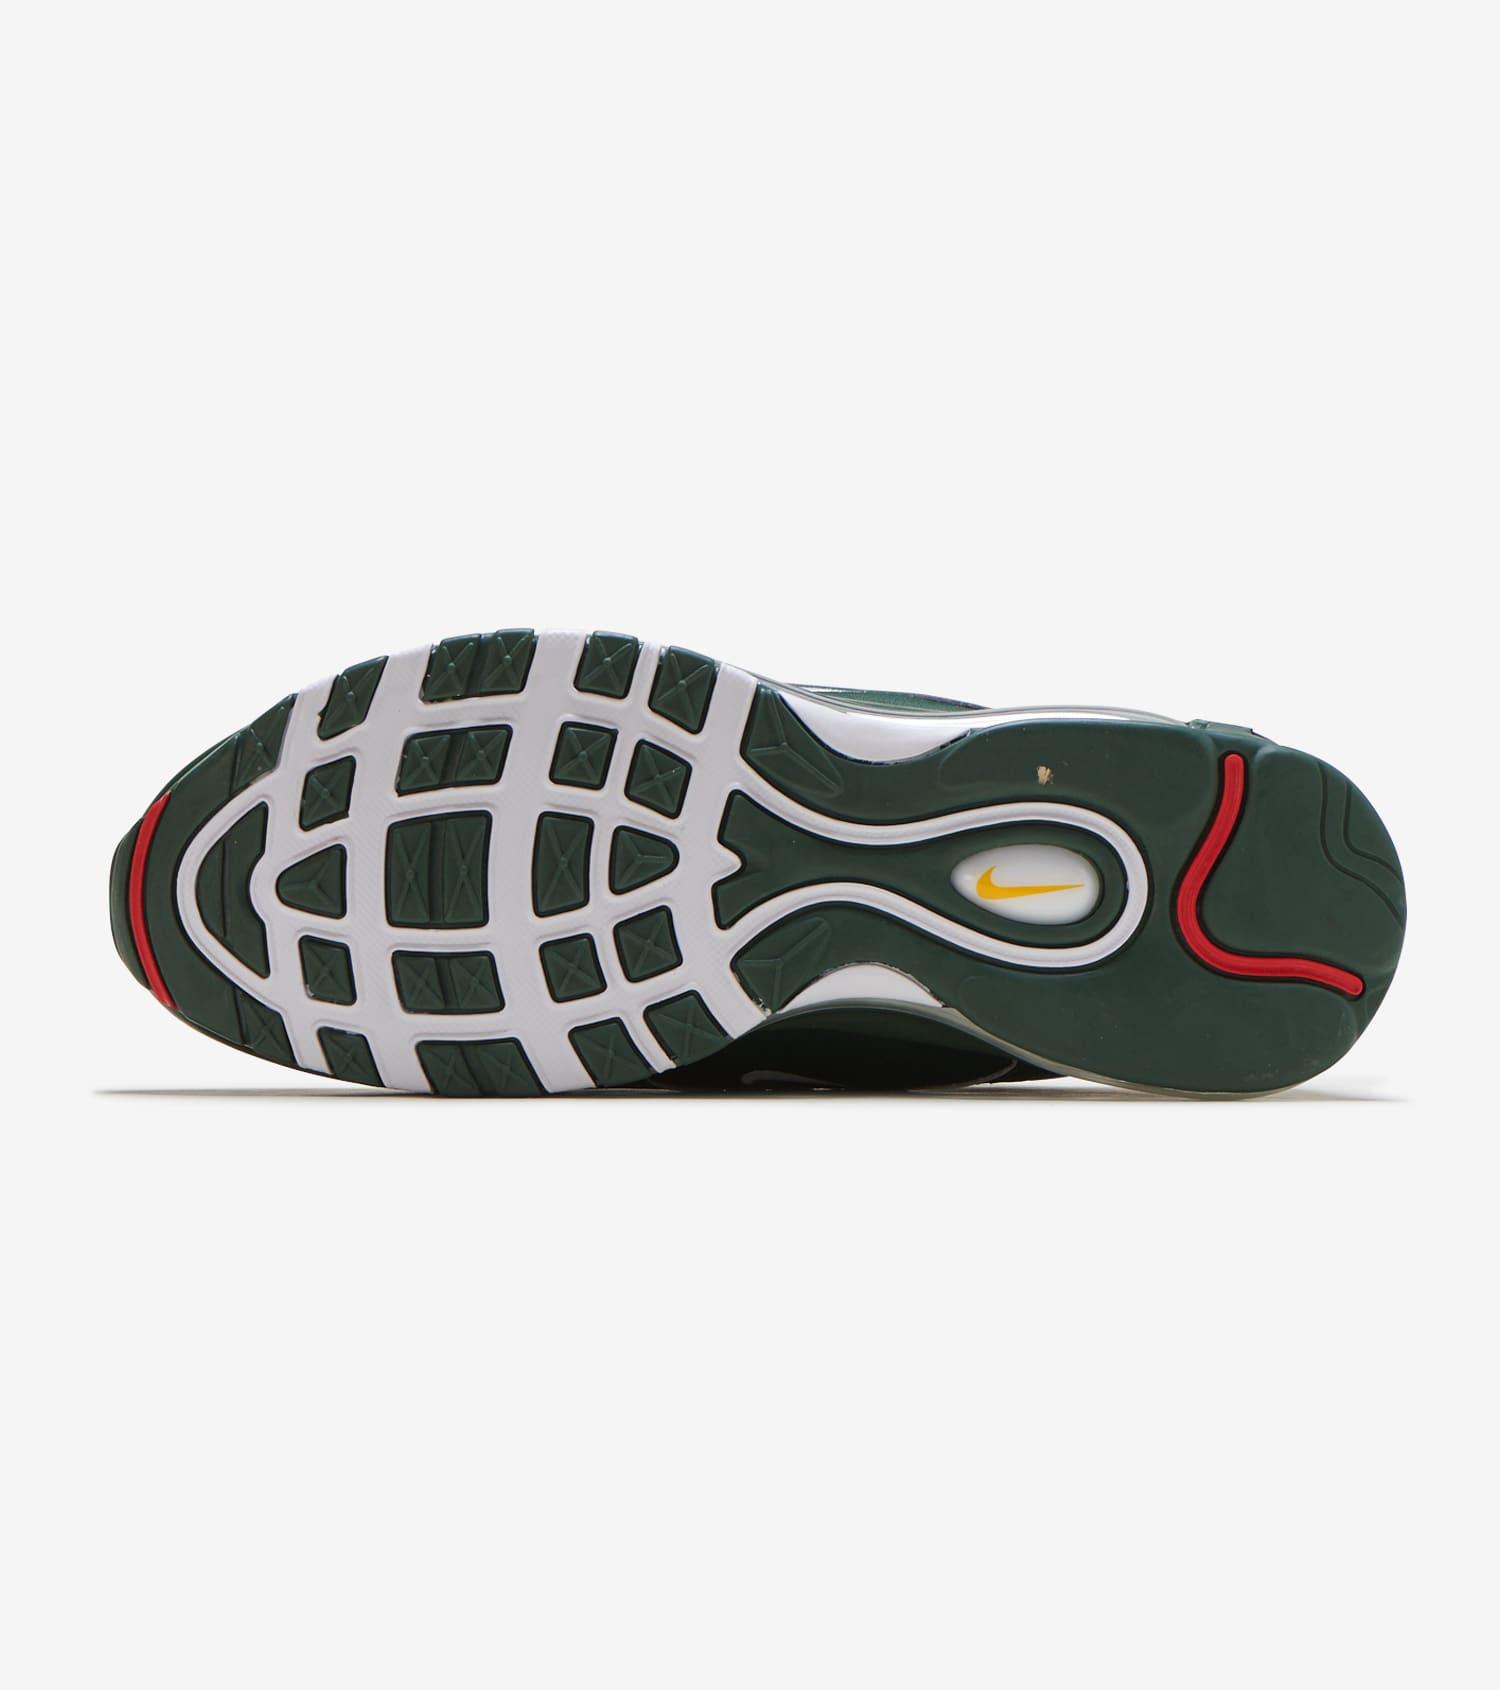 Nike Sneaker air Max 97 Se Herren Schuhe Die Beliebtesten